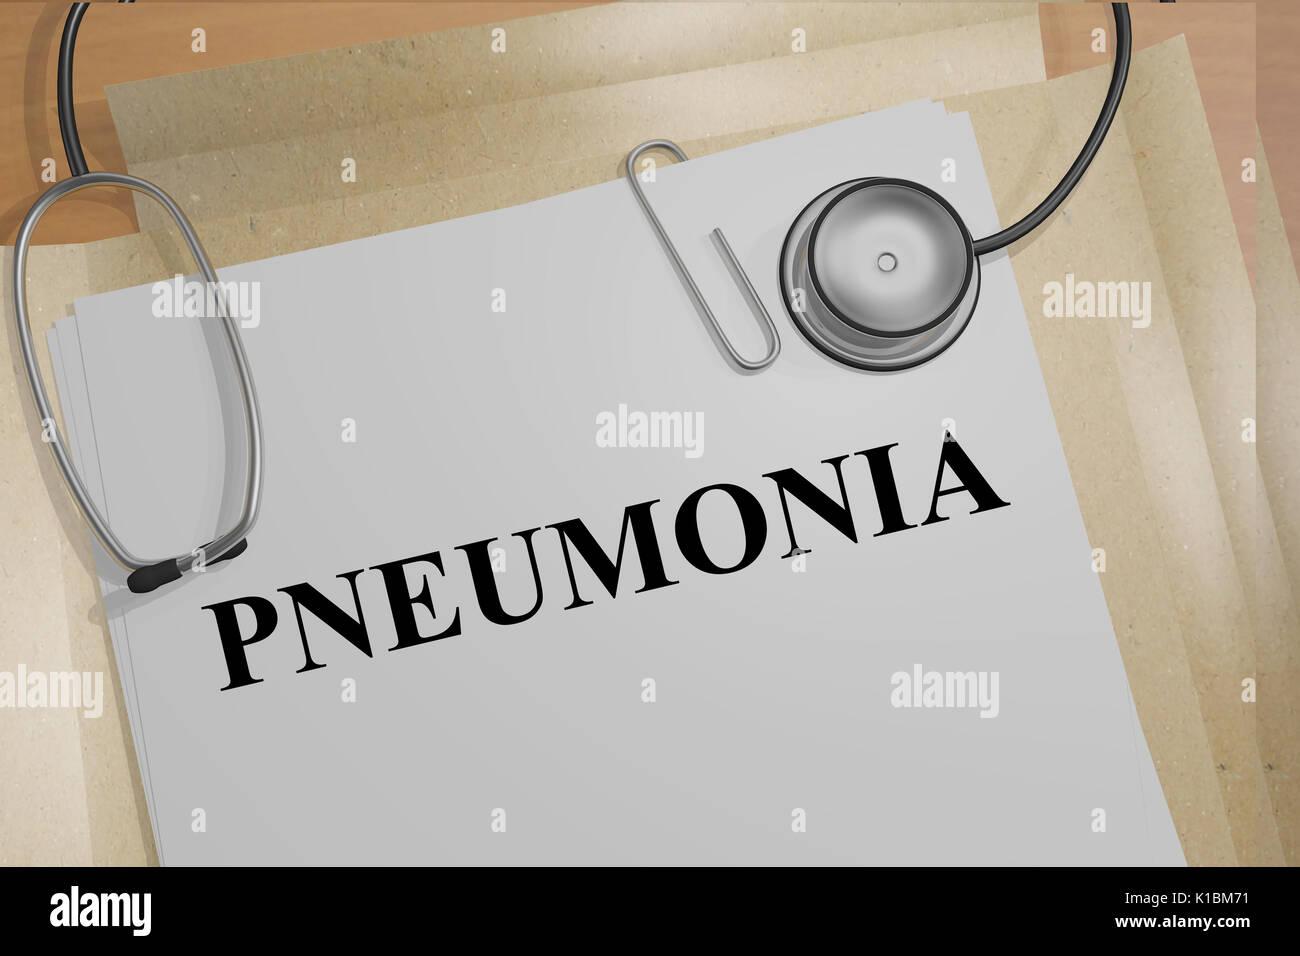 Render illustration of Pneumonia title on medical documents - Stock Image